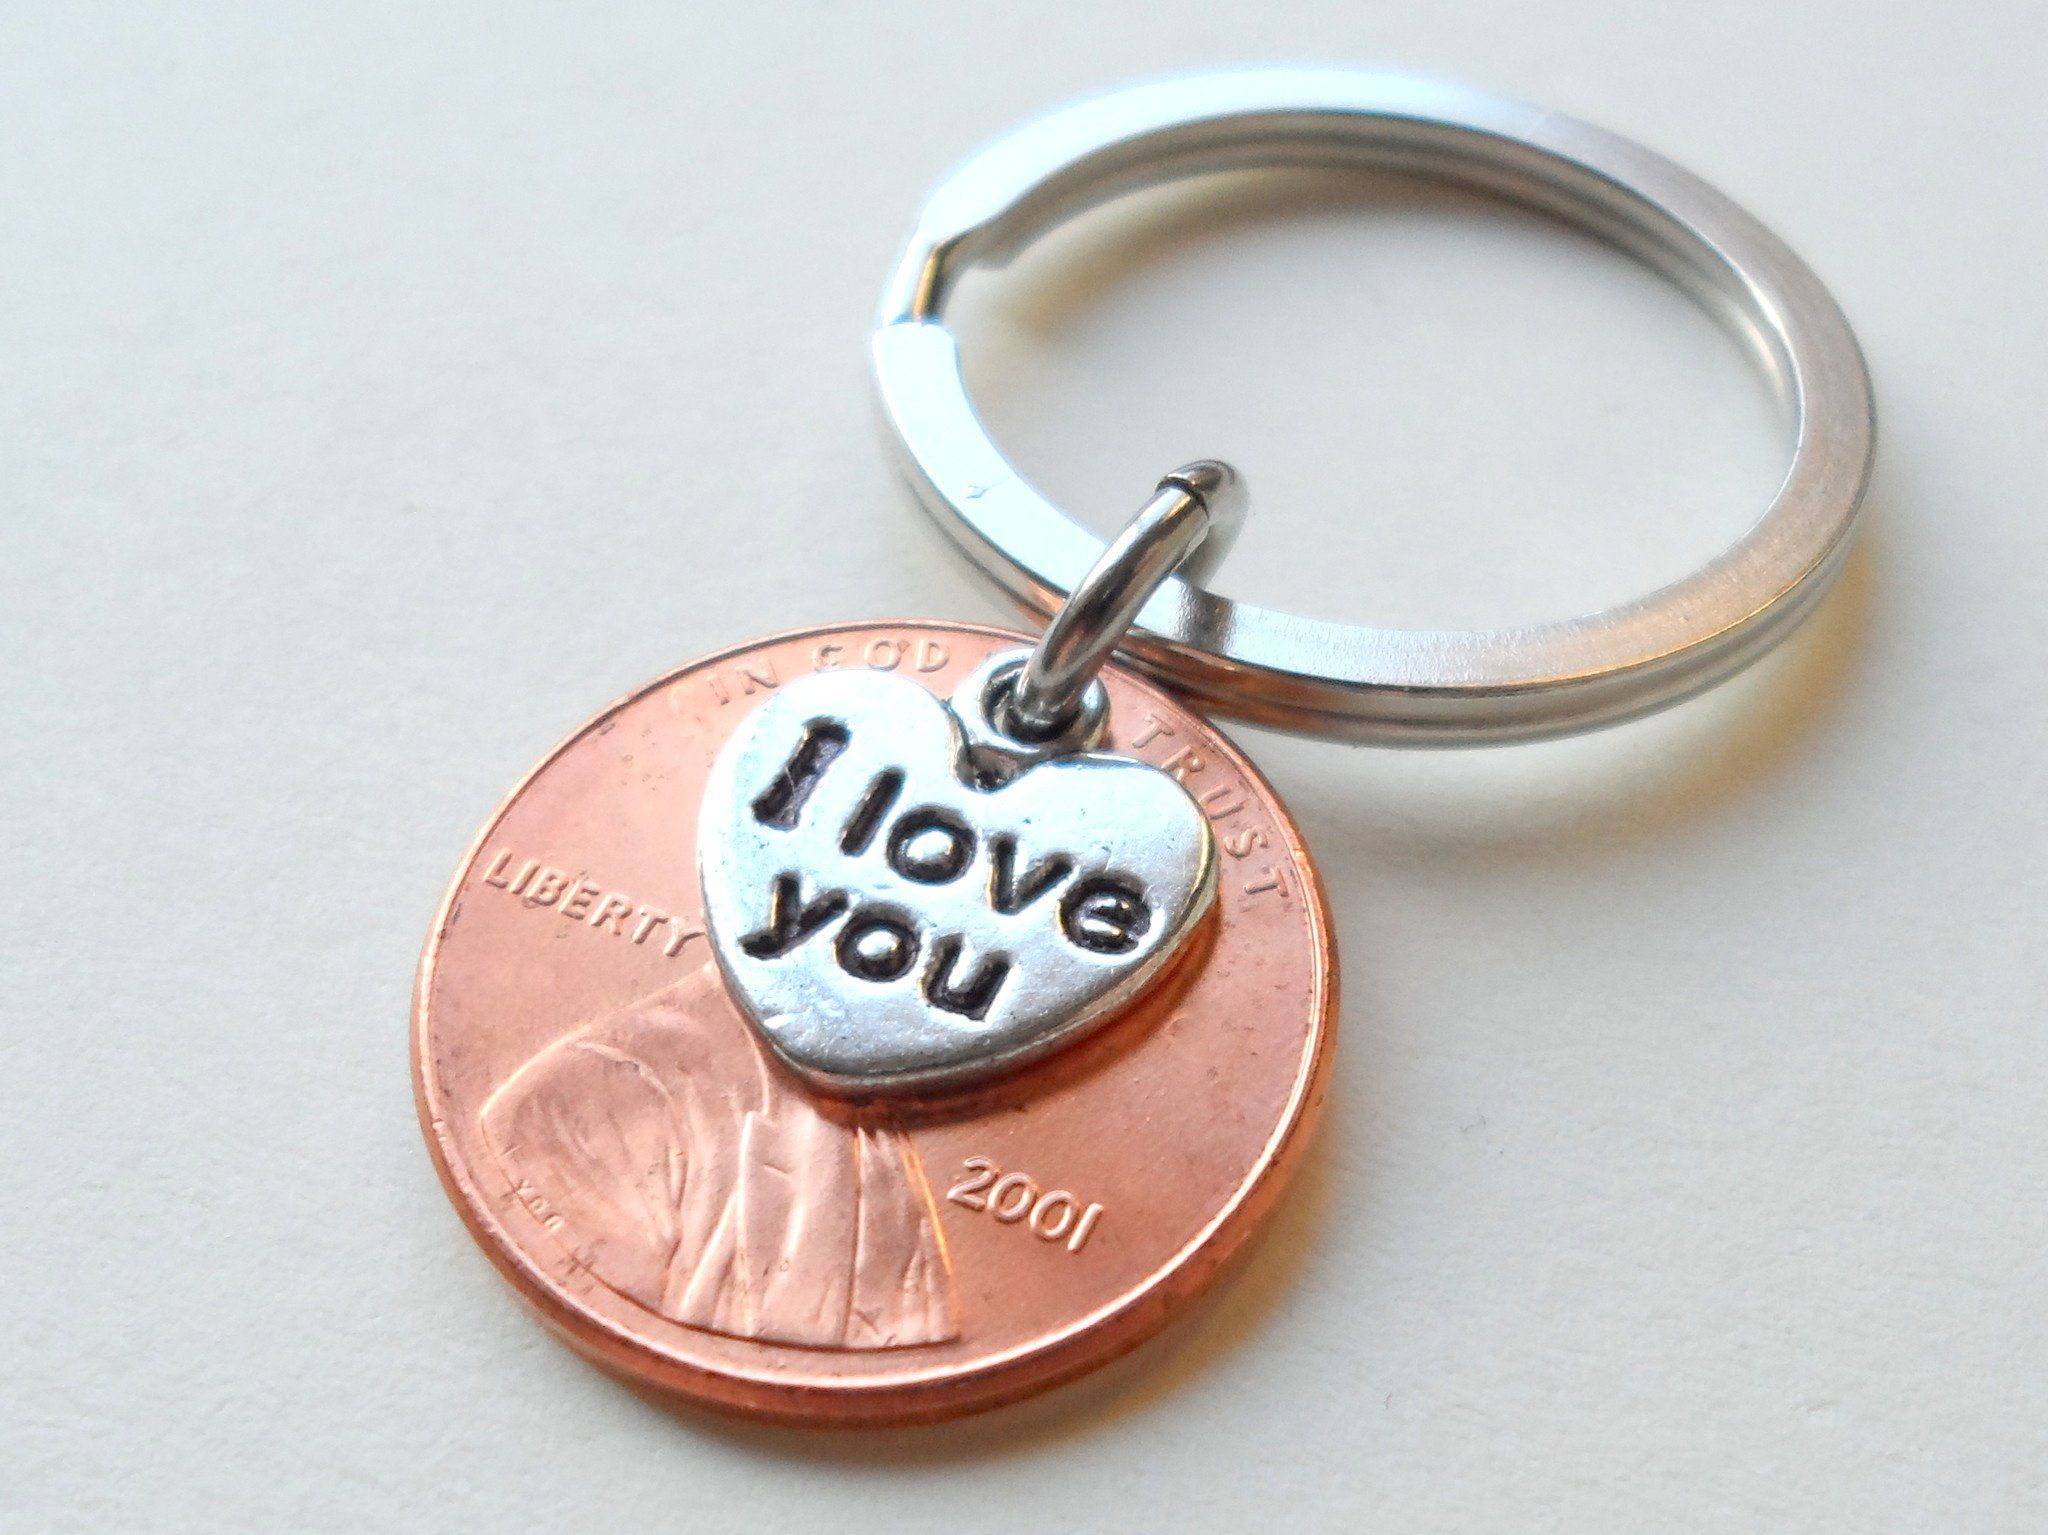 19 year anniversary gift 2001 penny keychain w i love